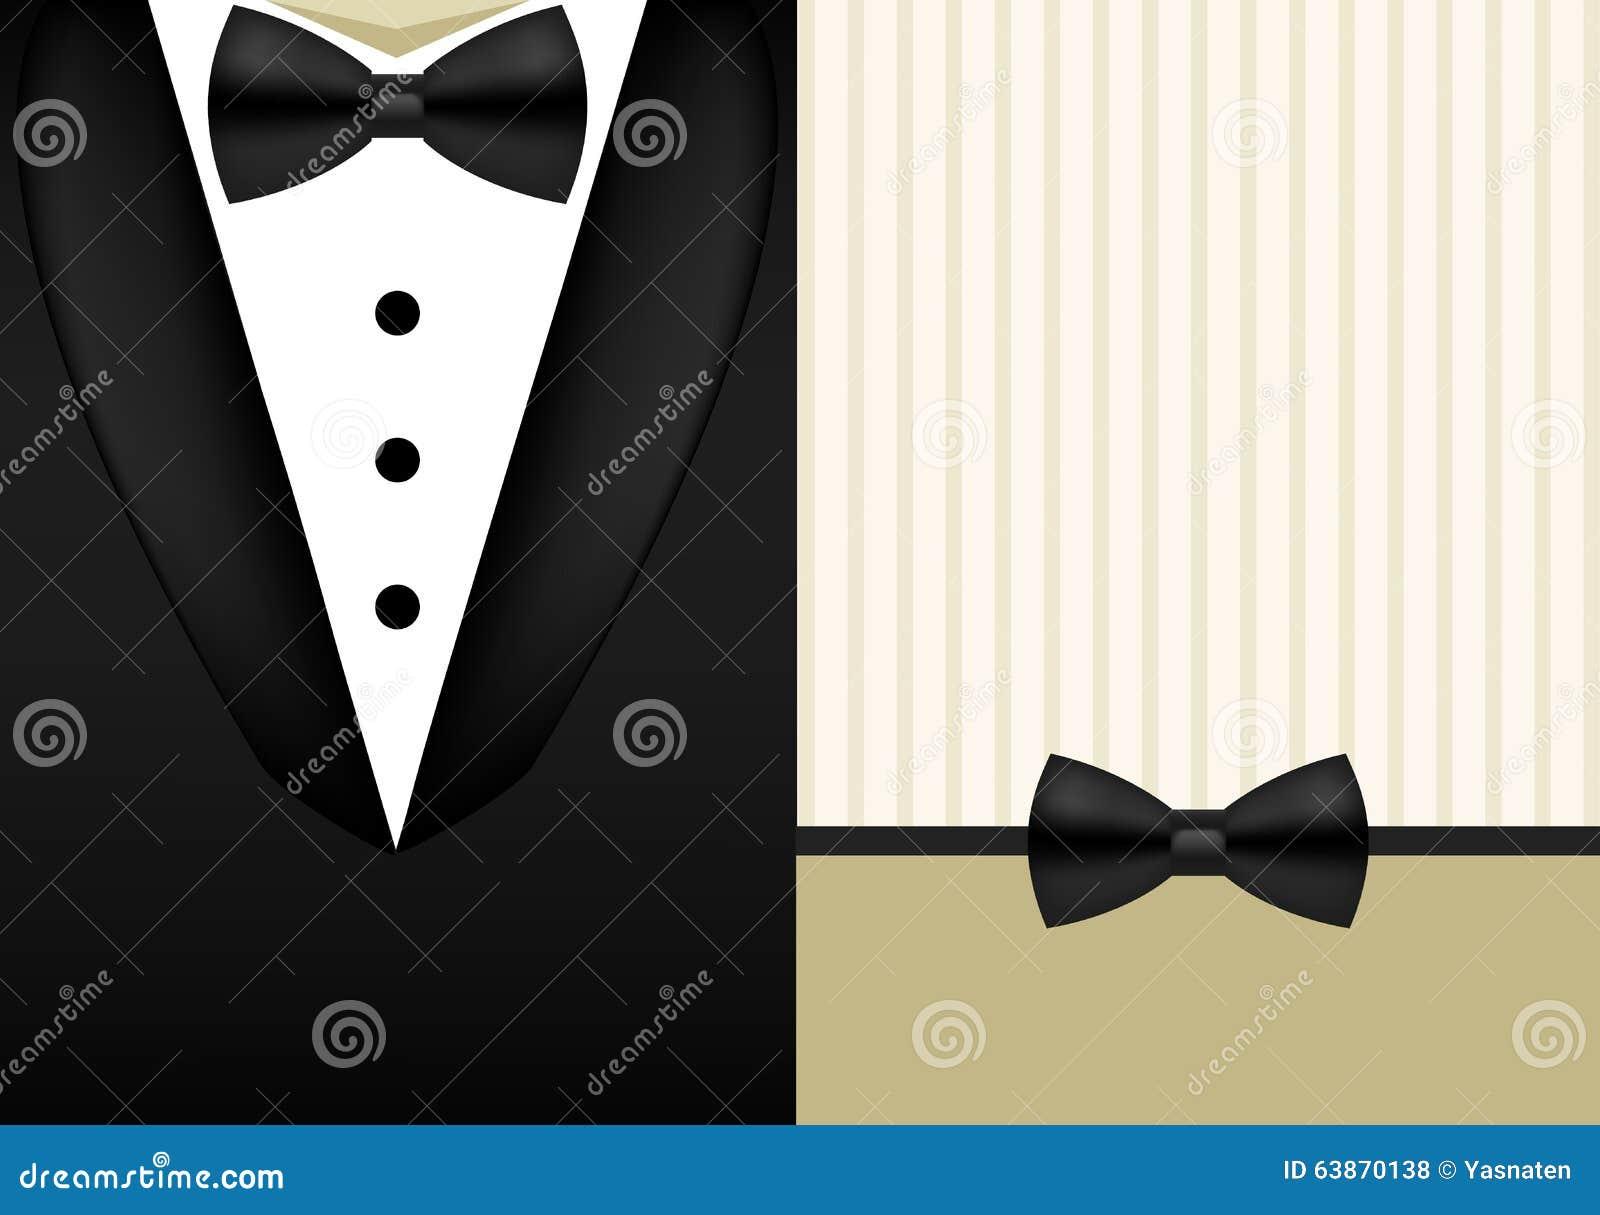 Vector bow tie tuxedo invitation design template stock vector download vector bow tie tuxedo invitation design template stock vector illustration of jacket male maxwellsz